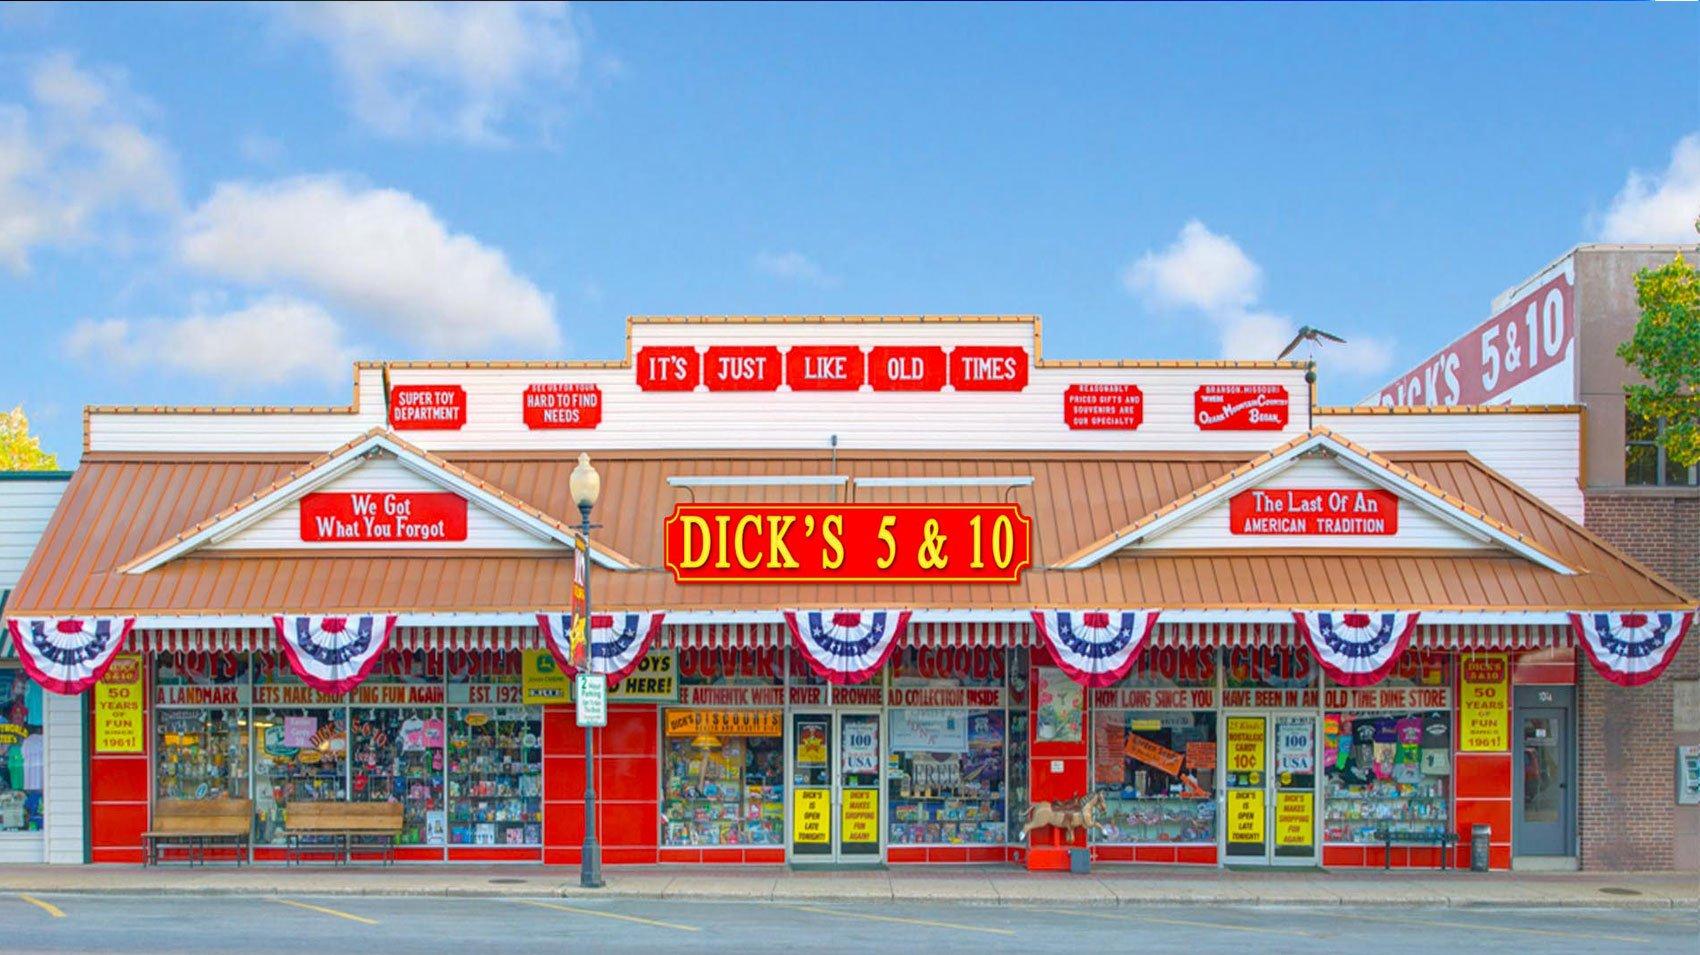 Dicks 5 & 10